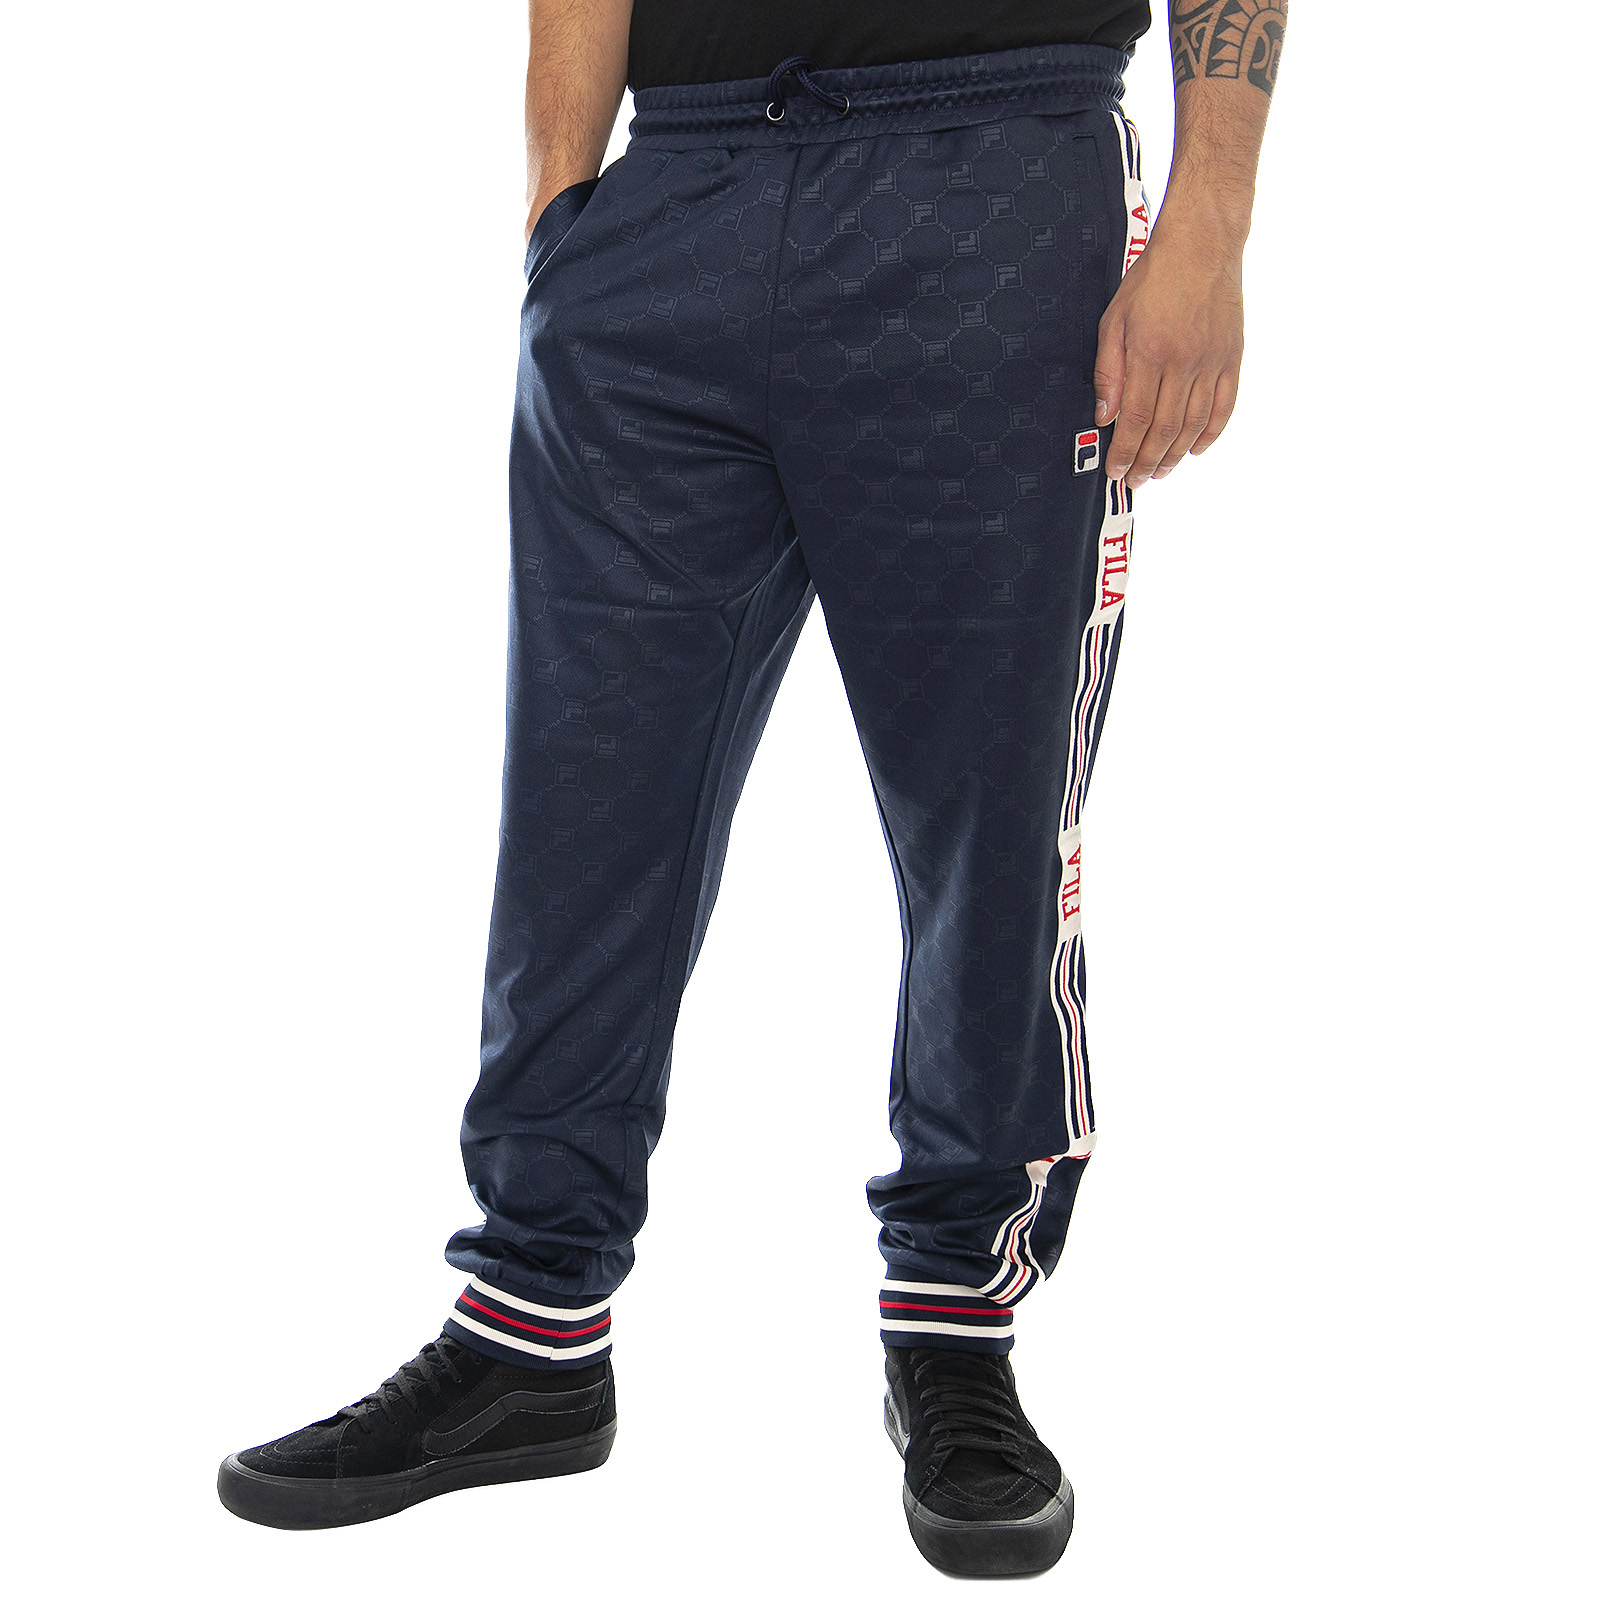 Détails sur Fila Mn Avtandie Track Haleter Black Iris Pantalon Sportifs Homme Bleu Bleu